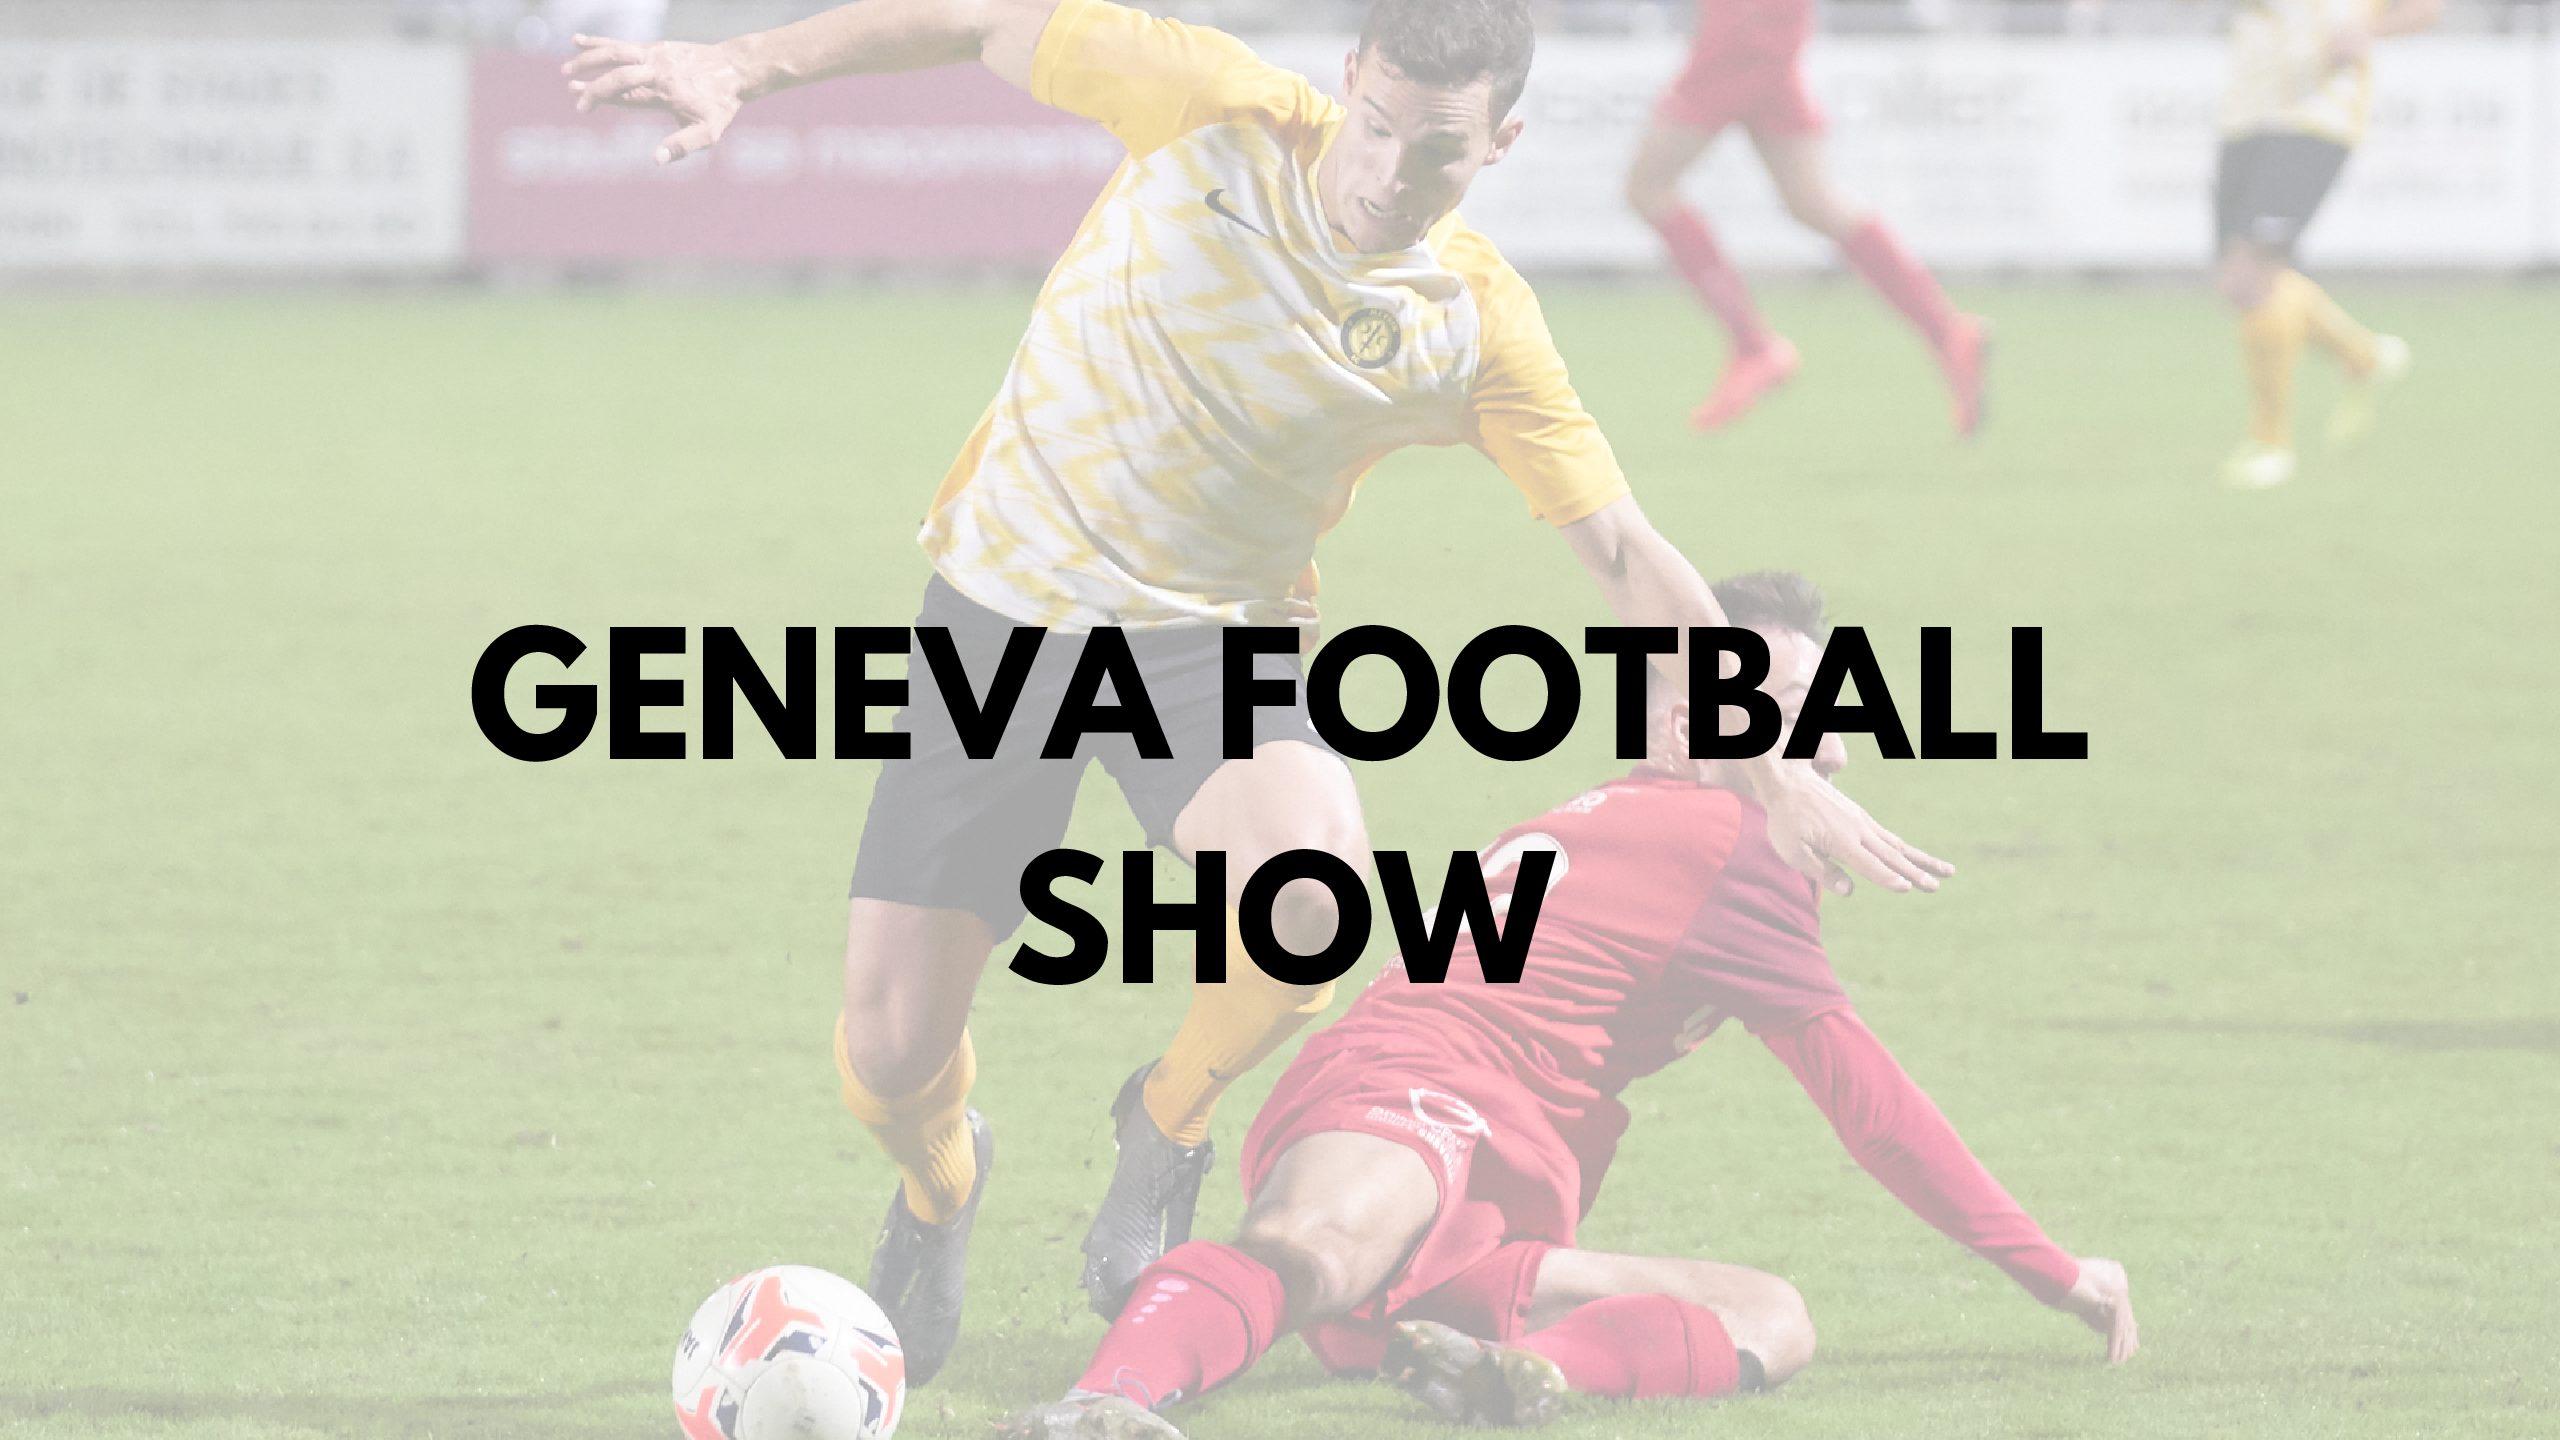 Geneva Football Show : le lancement !